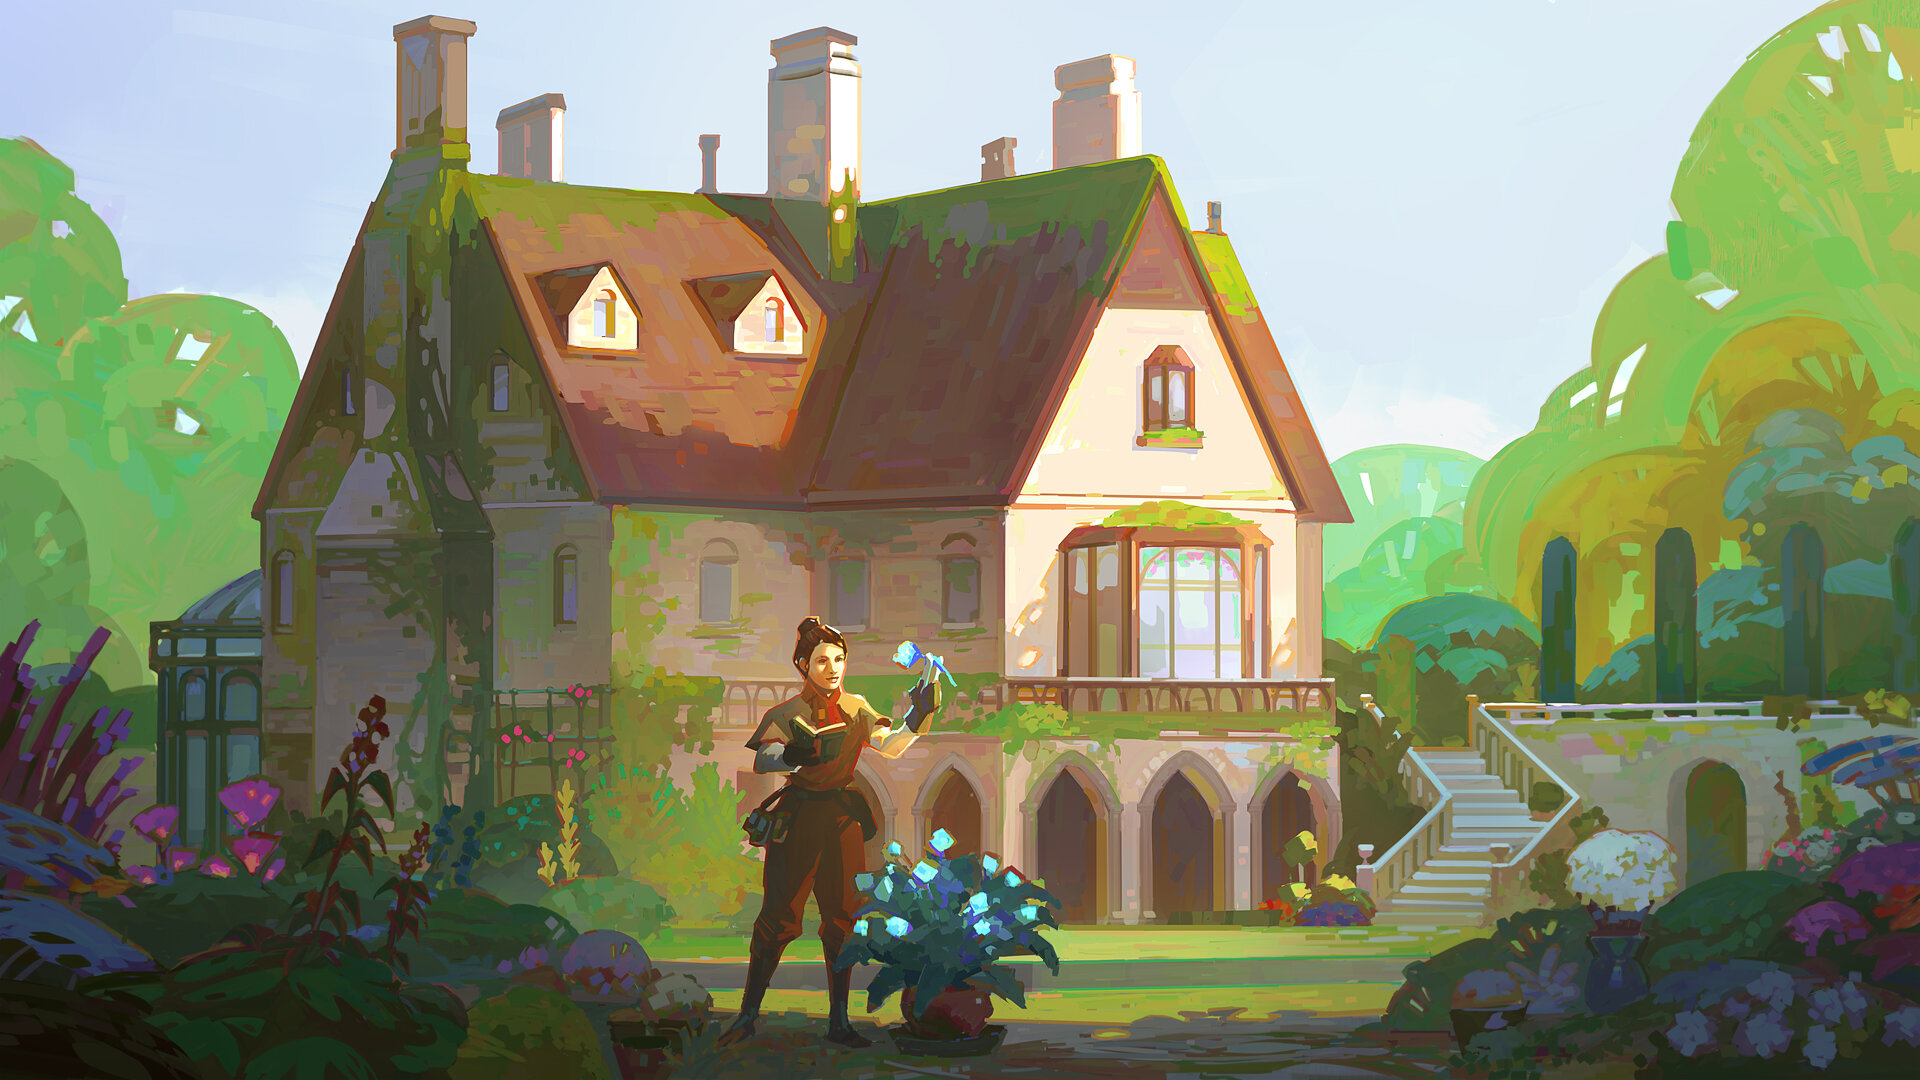 An illustration of Botany Manor concept art